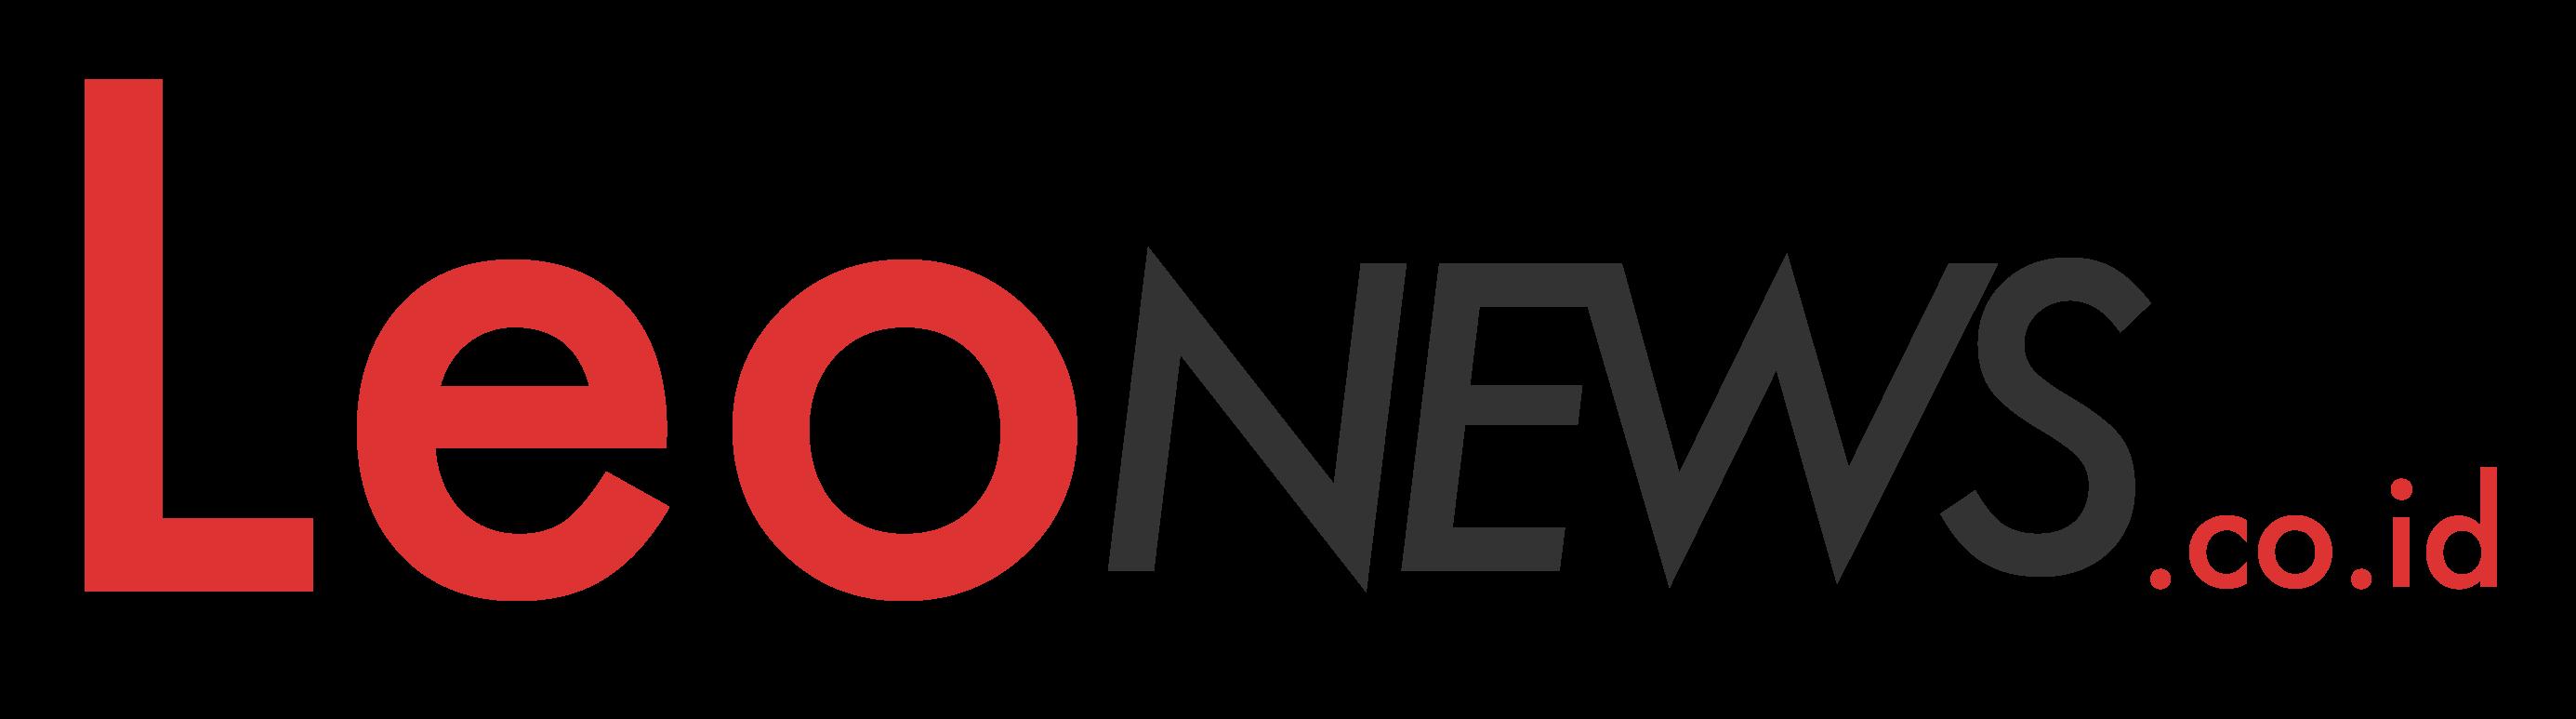 leonews.co.id